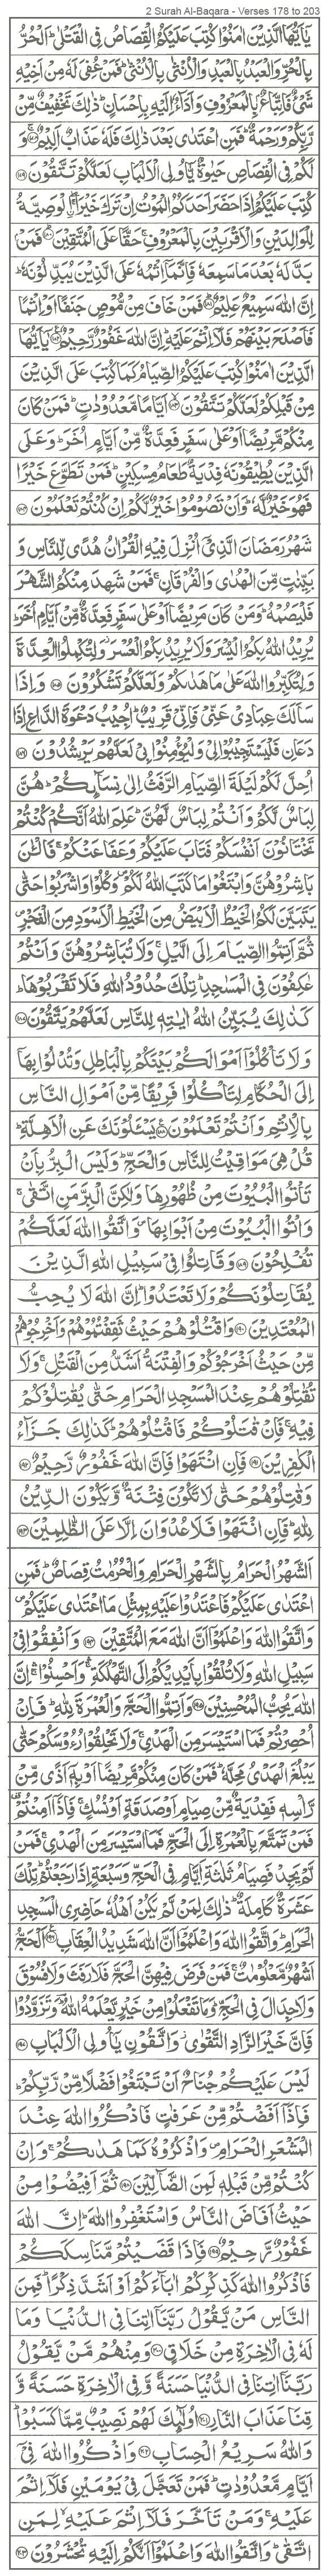 2 Surah Al-Baqarah - Verses 178 to 203